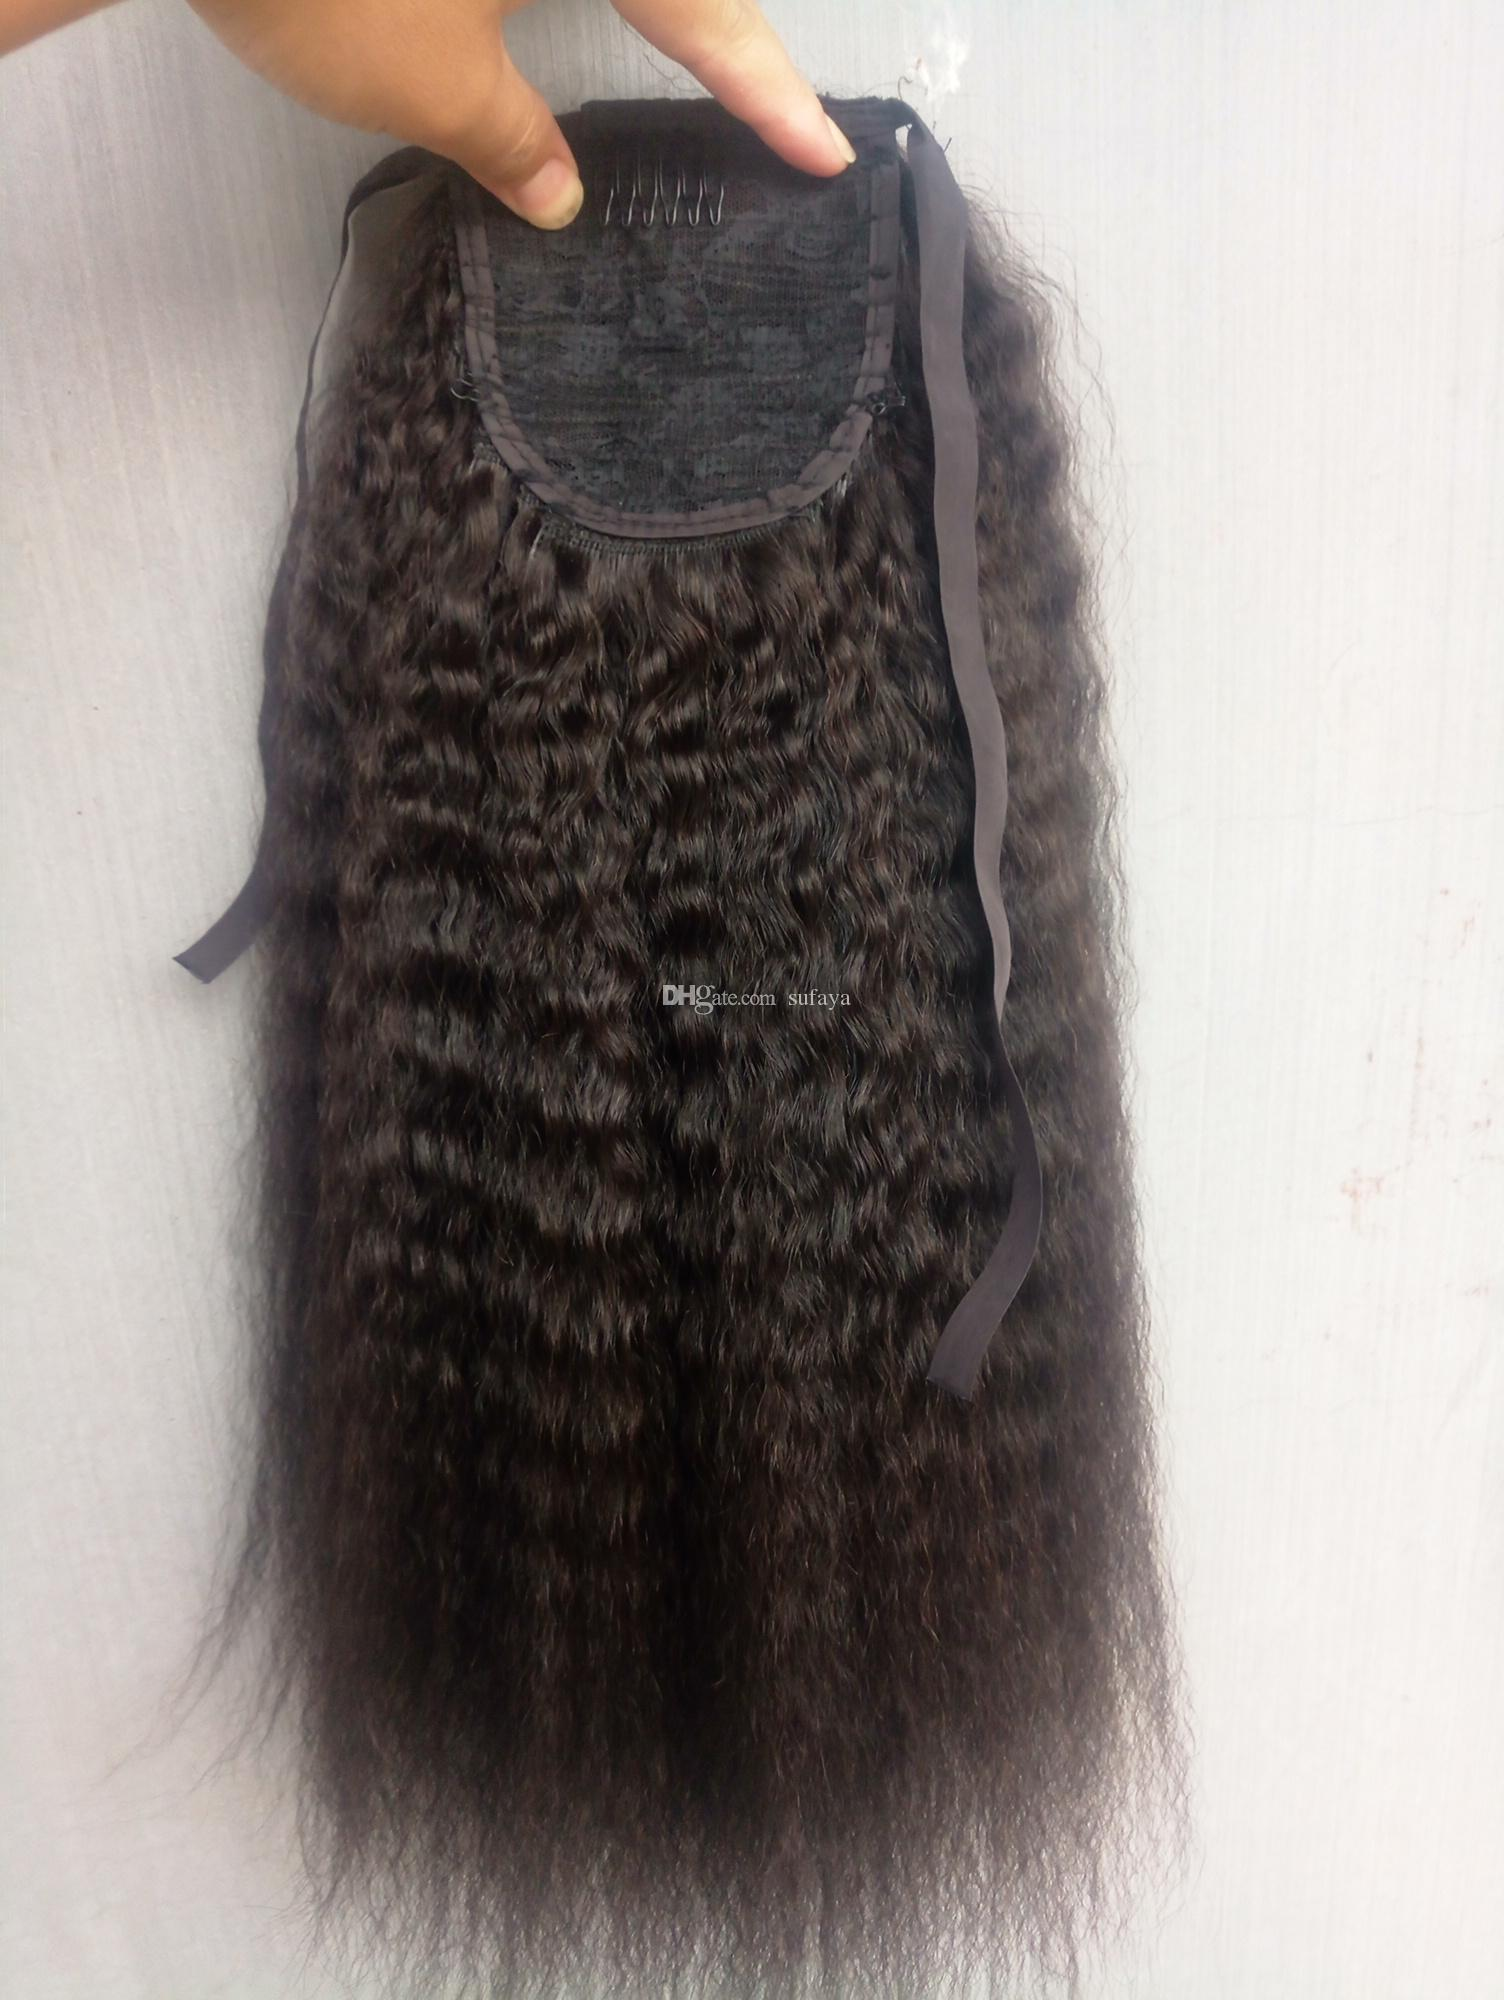 Sufaya Full Head Brazilian Human Virgin Remy Kinky Straight Drawstring Ponytail Hair Extensions Natral Black Color 1b Color 150g one bundle